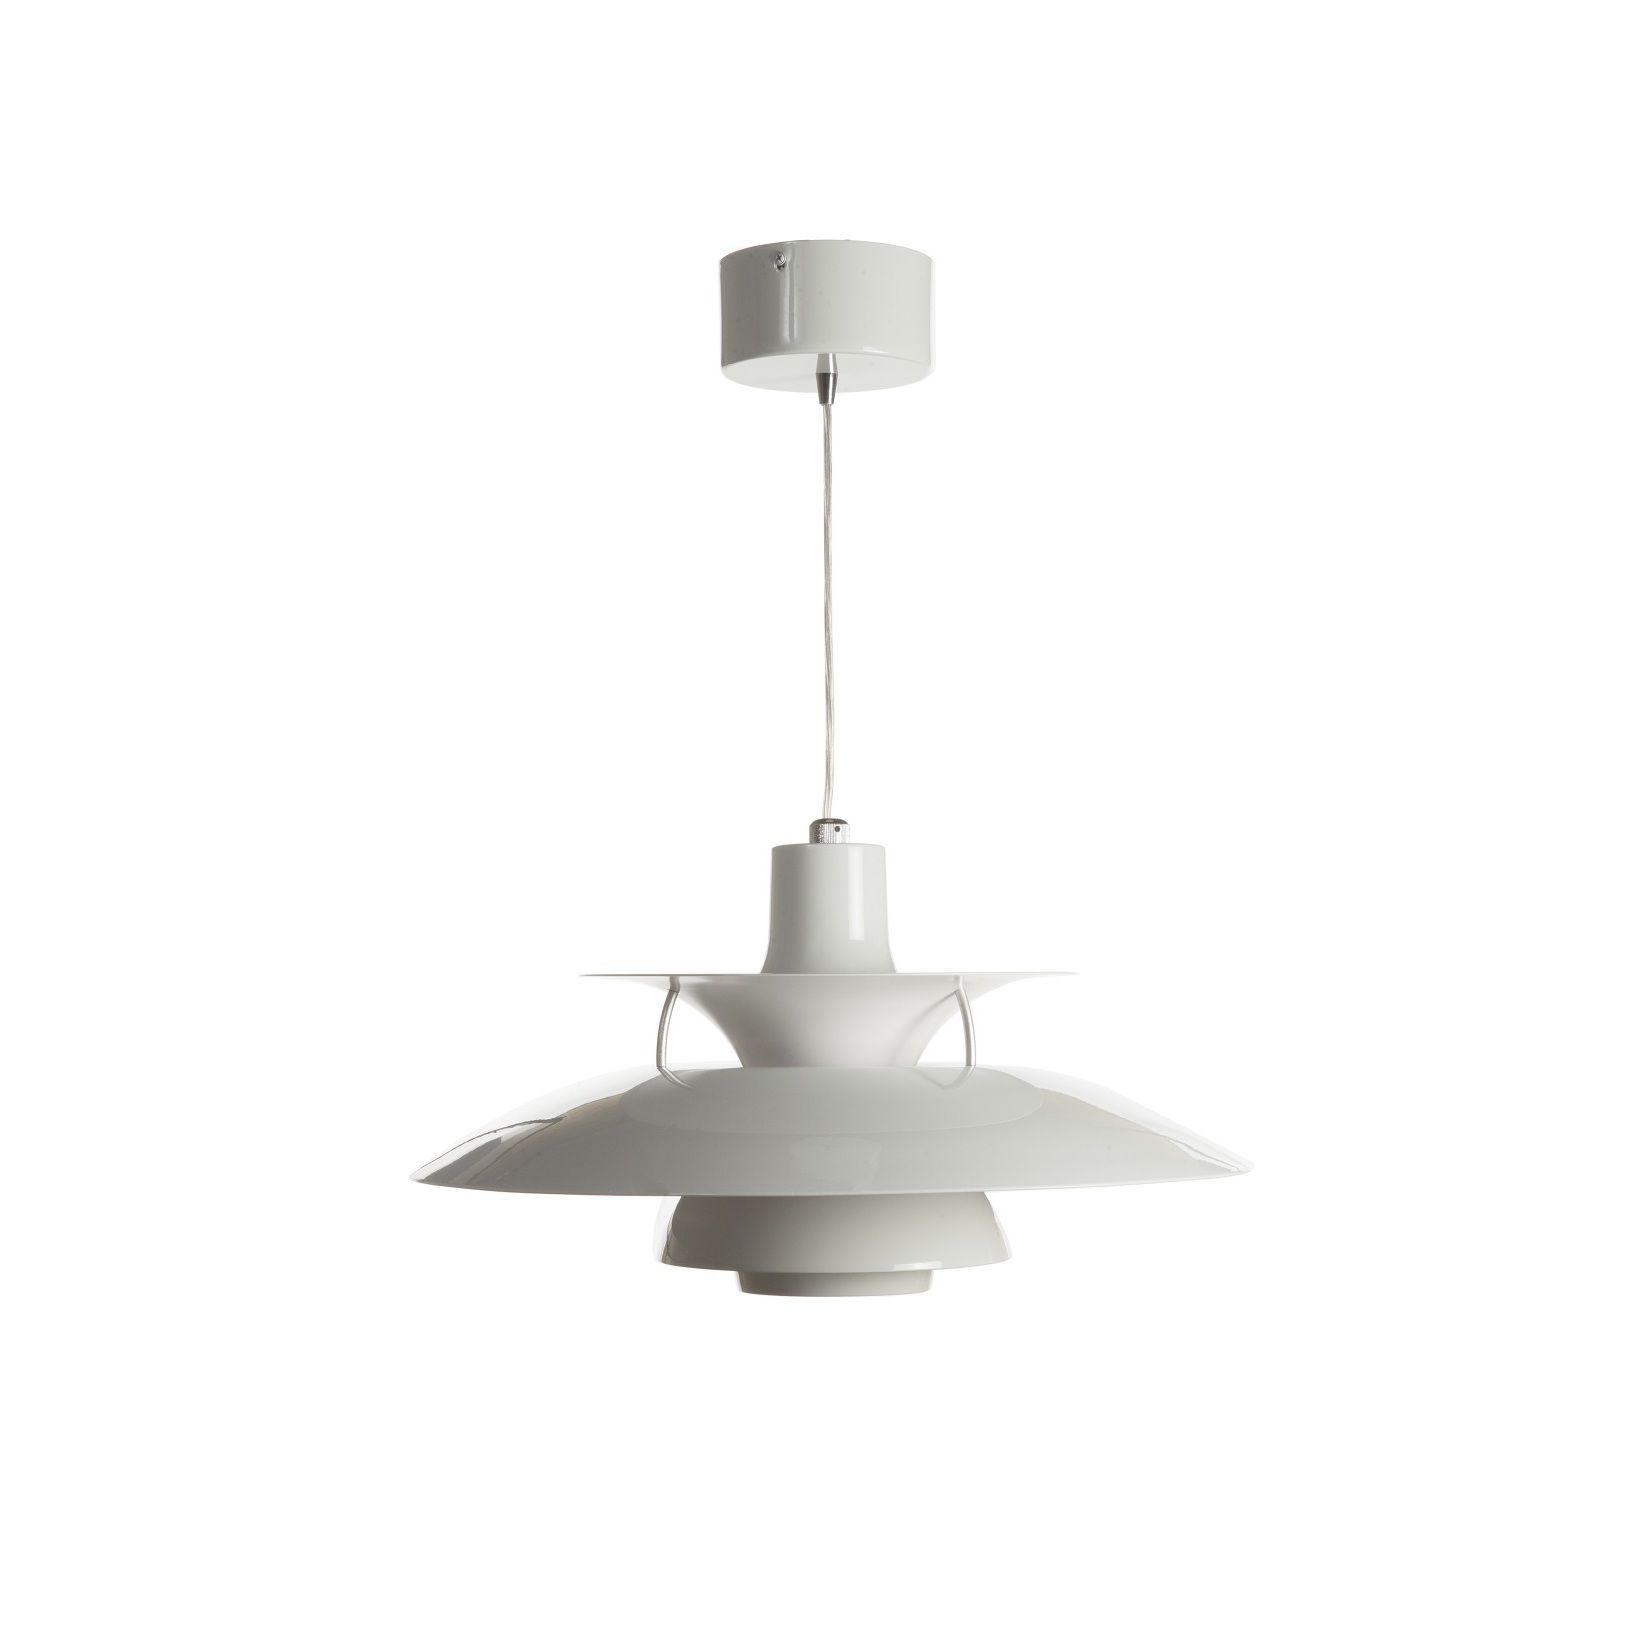 Hans andersen home athy white pendant lamp athy pendant lamp white